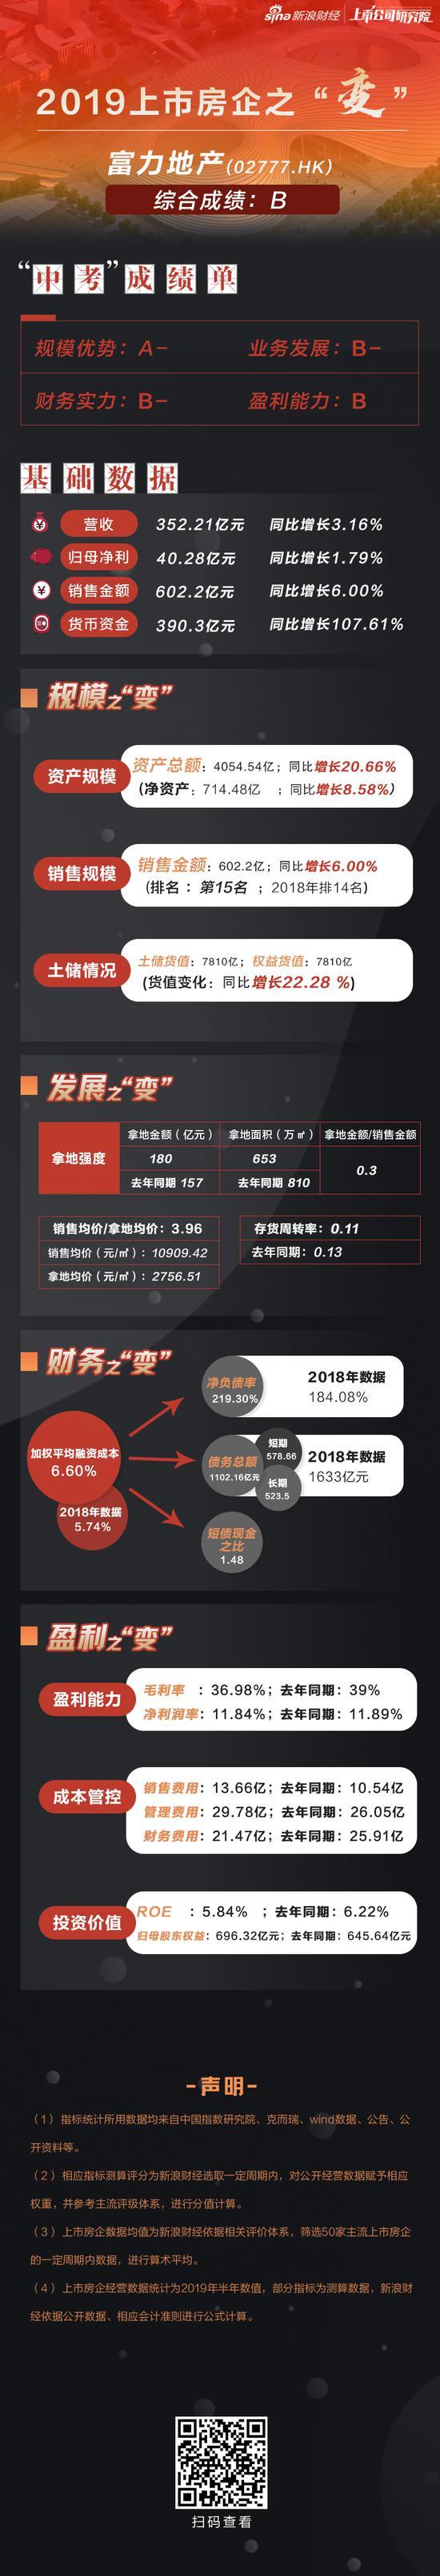 Redmi新品发布会提前预览 除了手机还有互联网电视